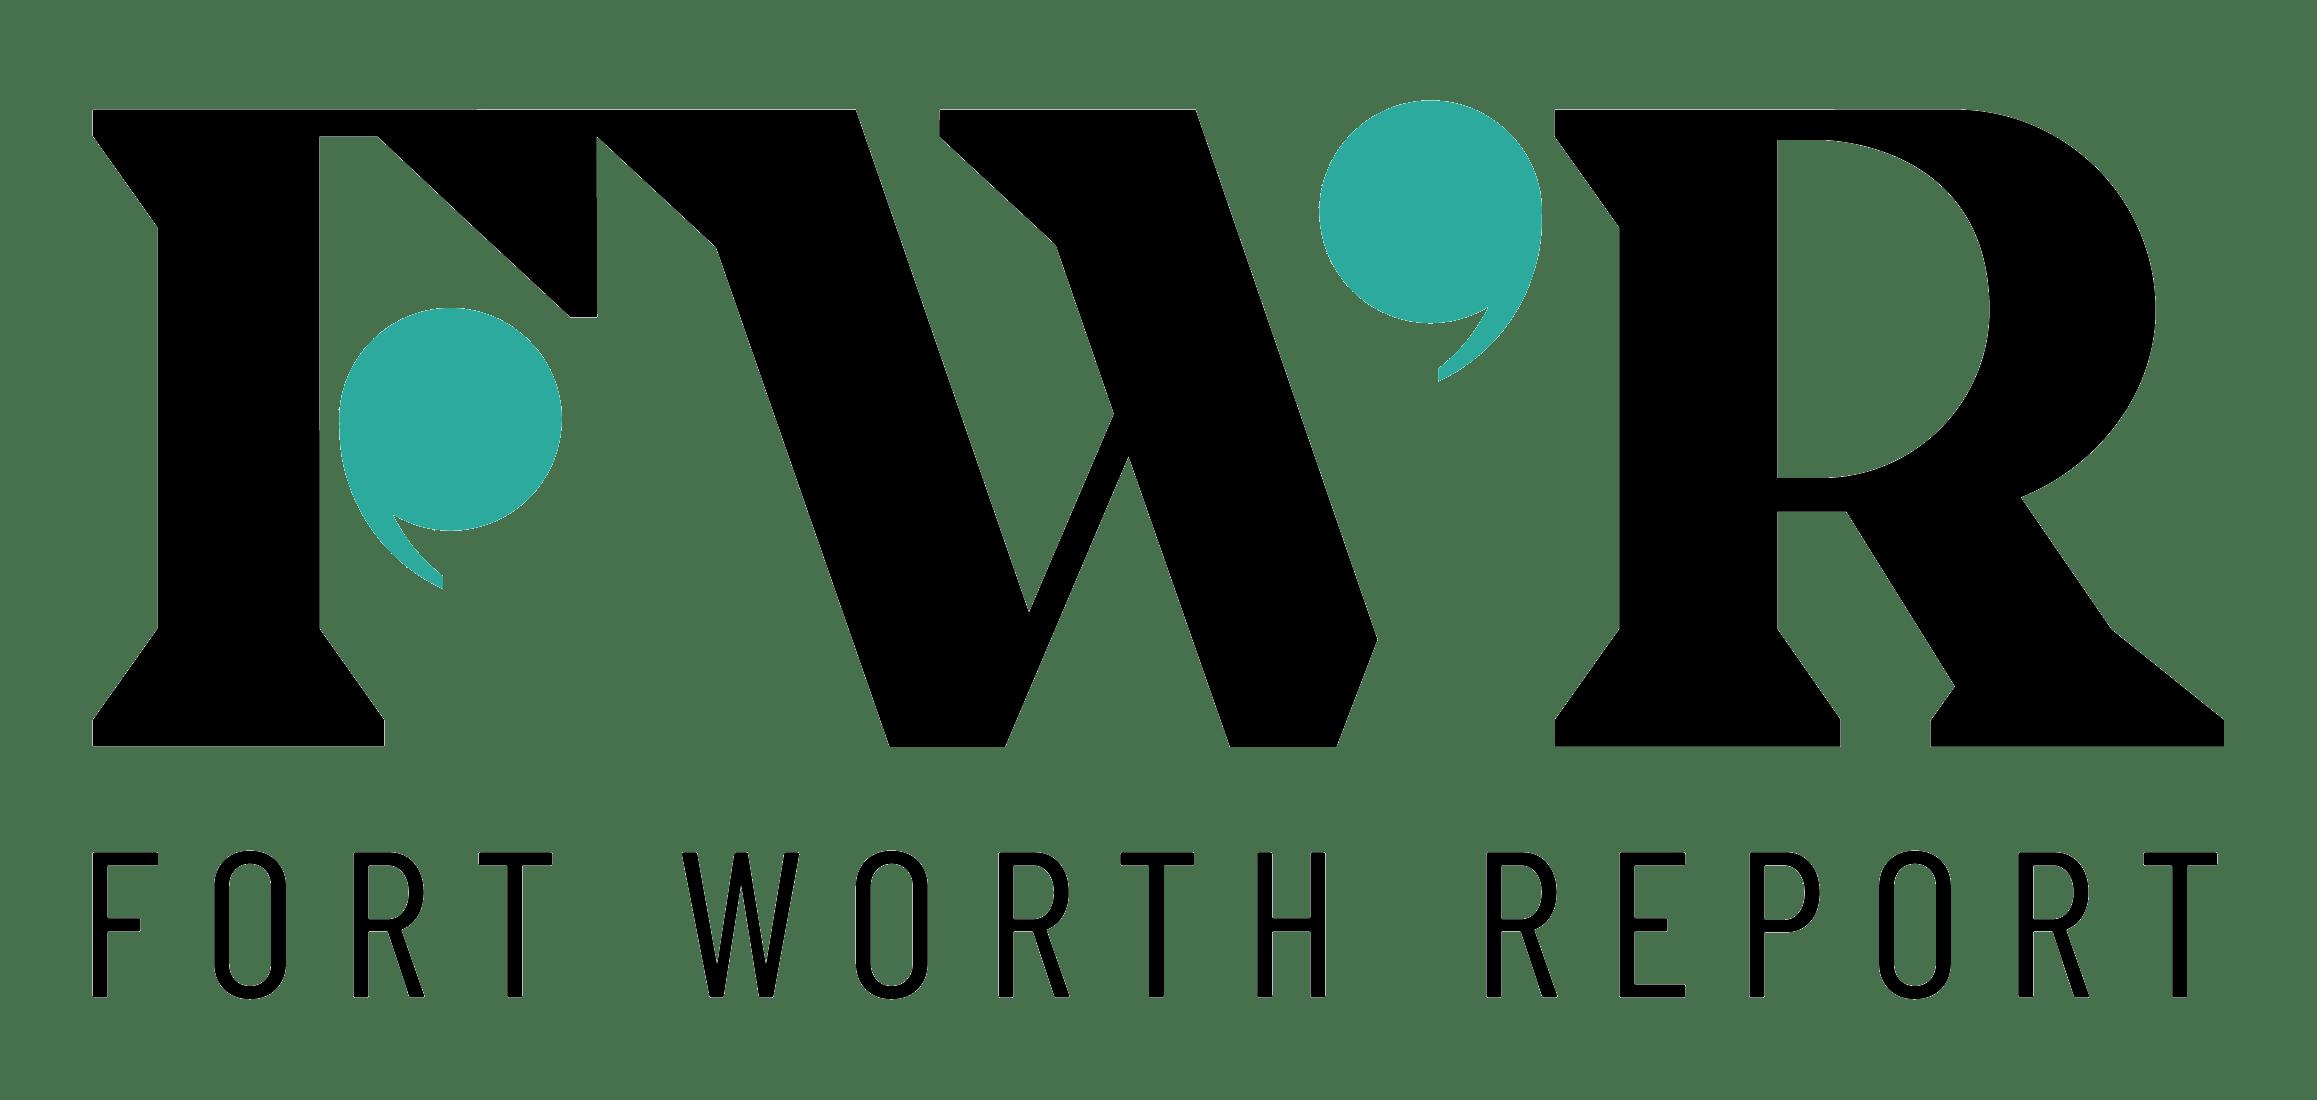 Fort Worth Report